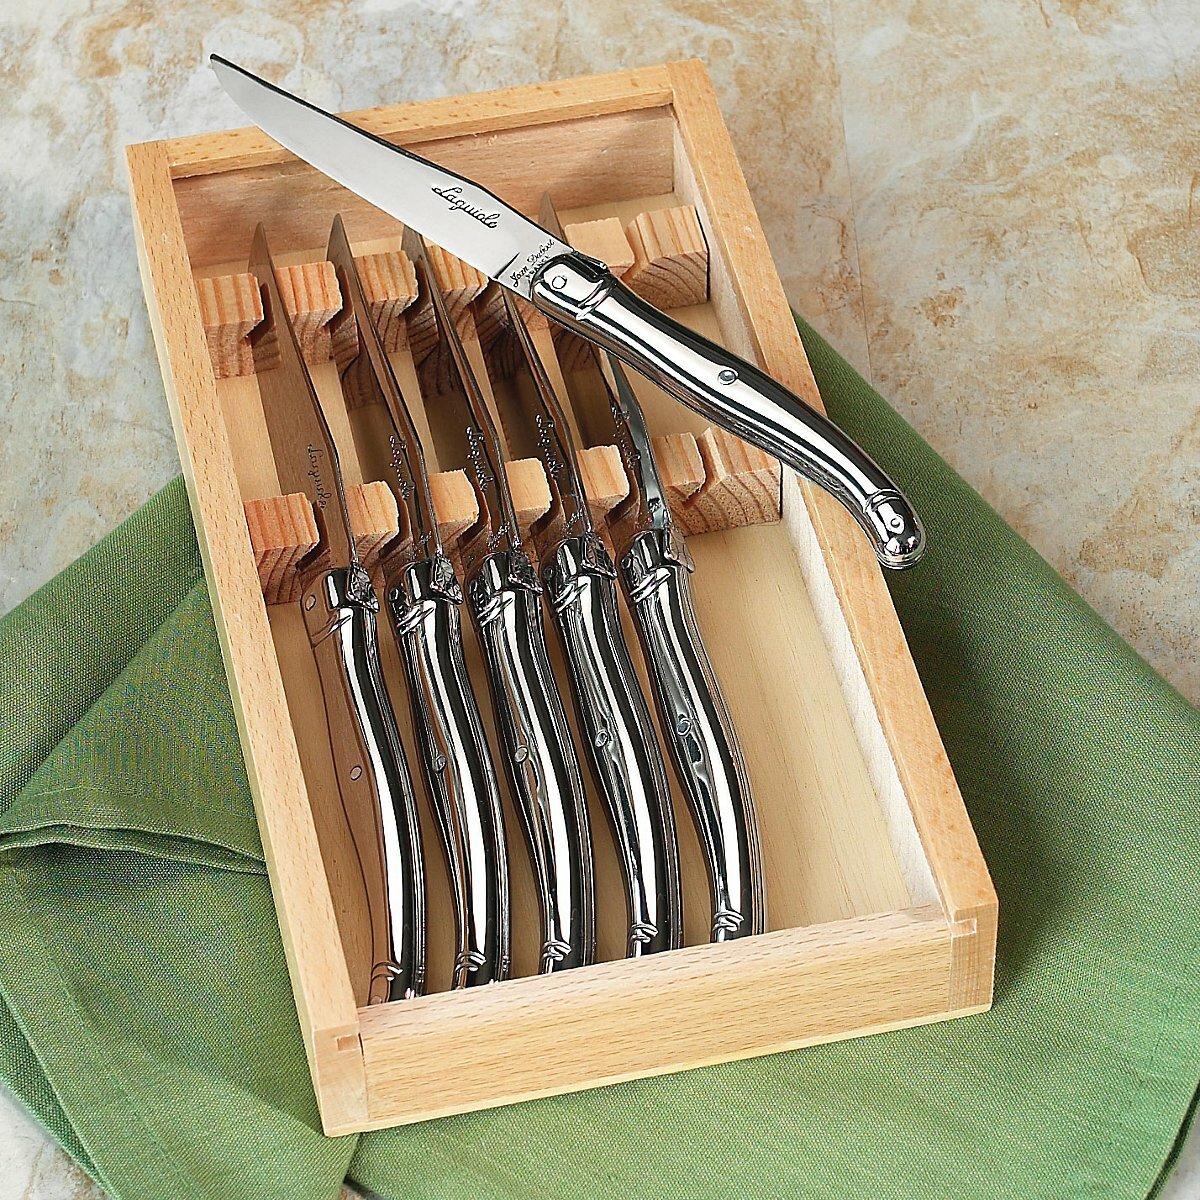 jean dubost laguiole steak knife set reviews wayfair. Black Bedroom Furniture Sets. Home Design Ideas